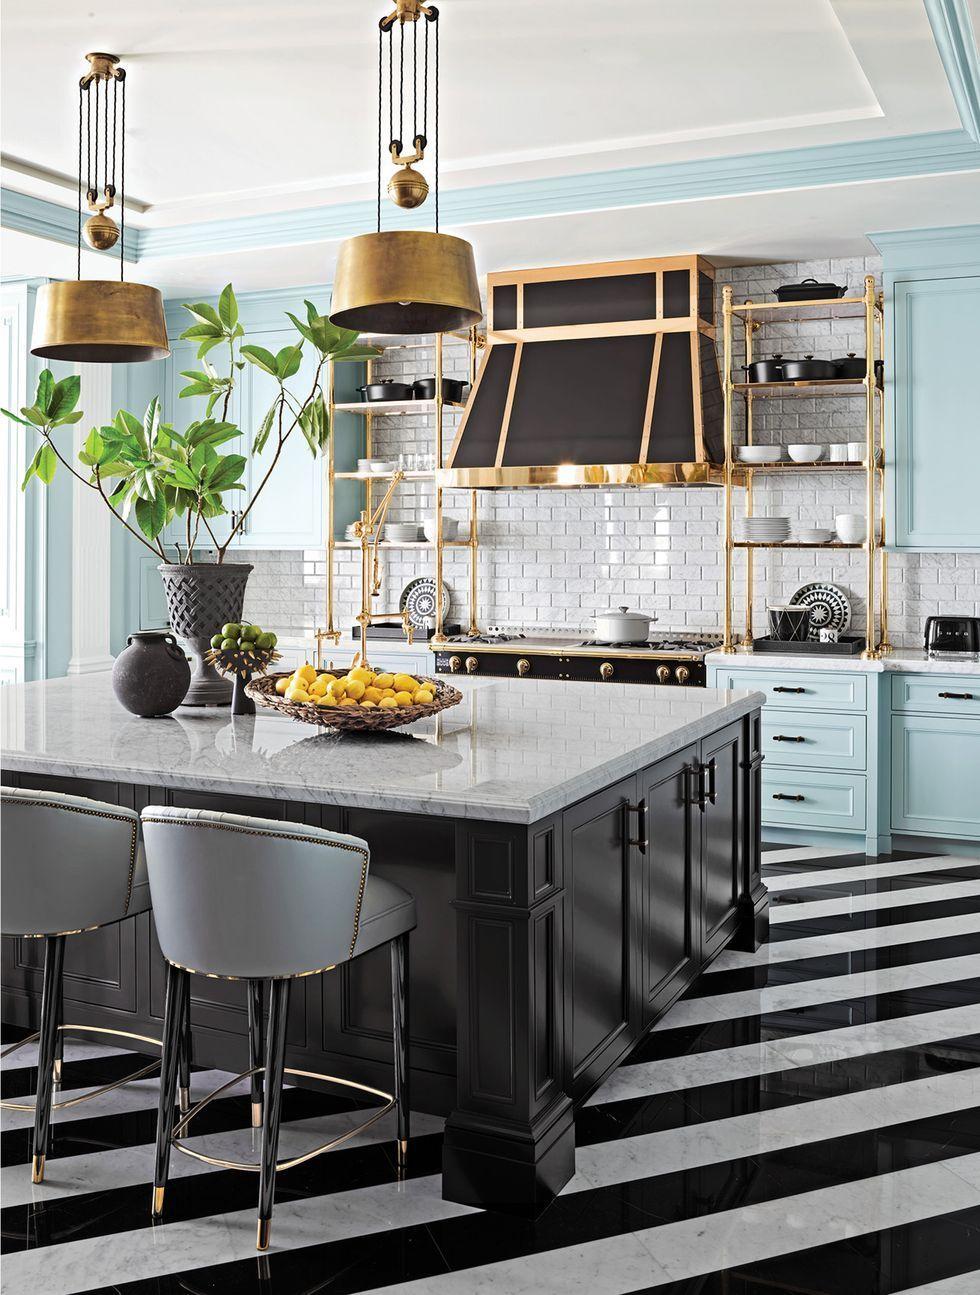 51 Gorgeous Kitchen Backsplash Ideas Best Kitchen Tile Ideas